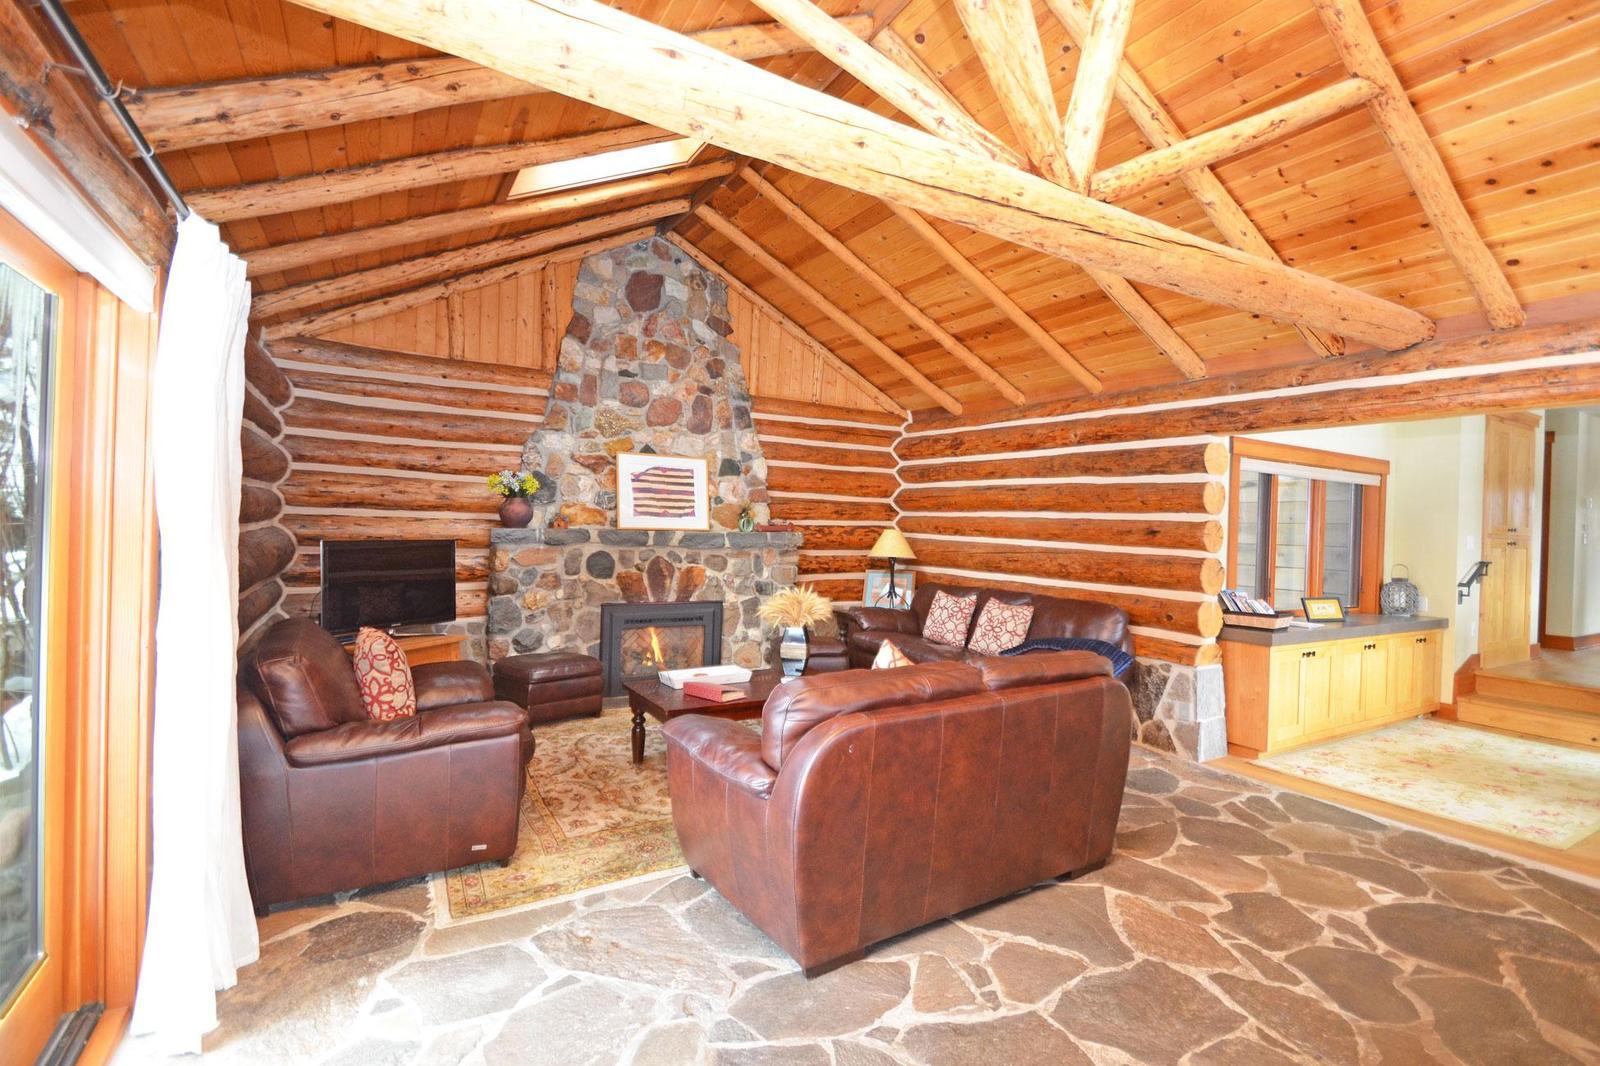 Mountain Ash Log Cabin | North Lake Tahoe Log Cabin Charm